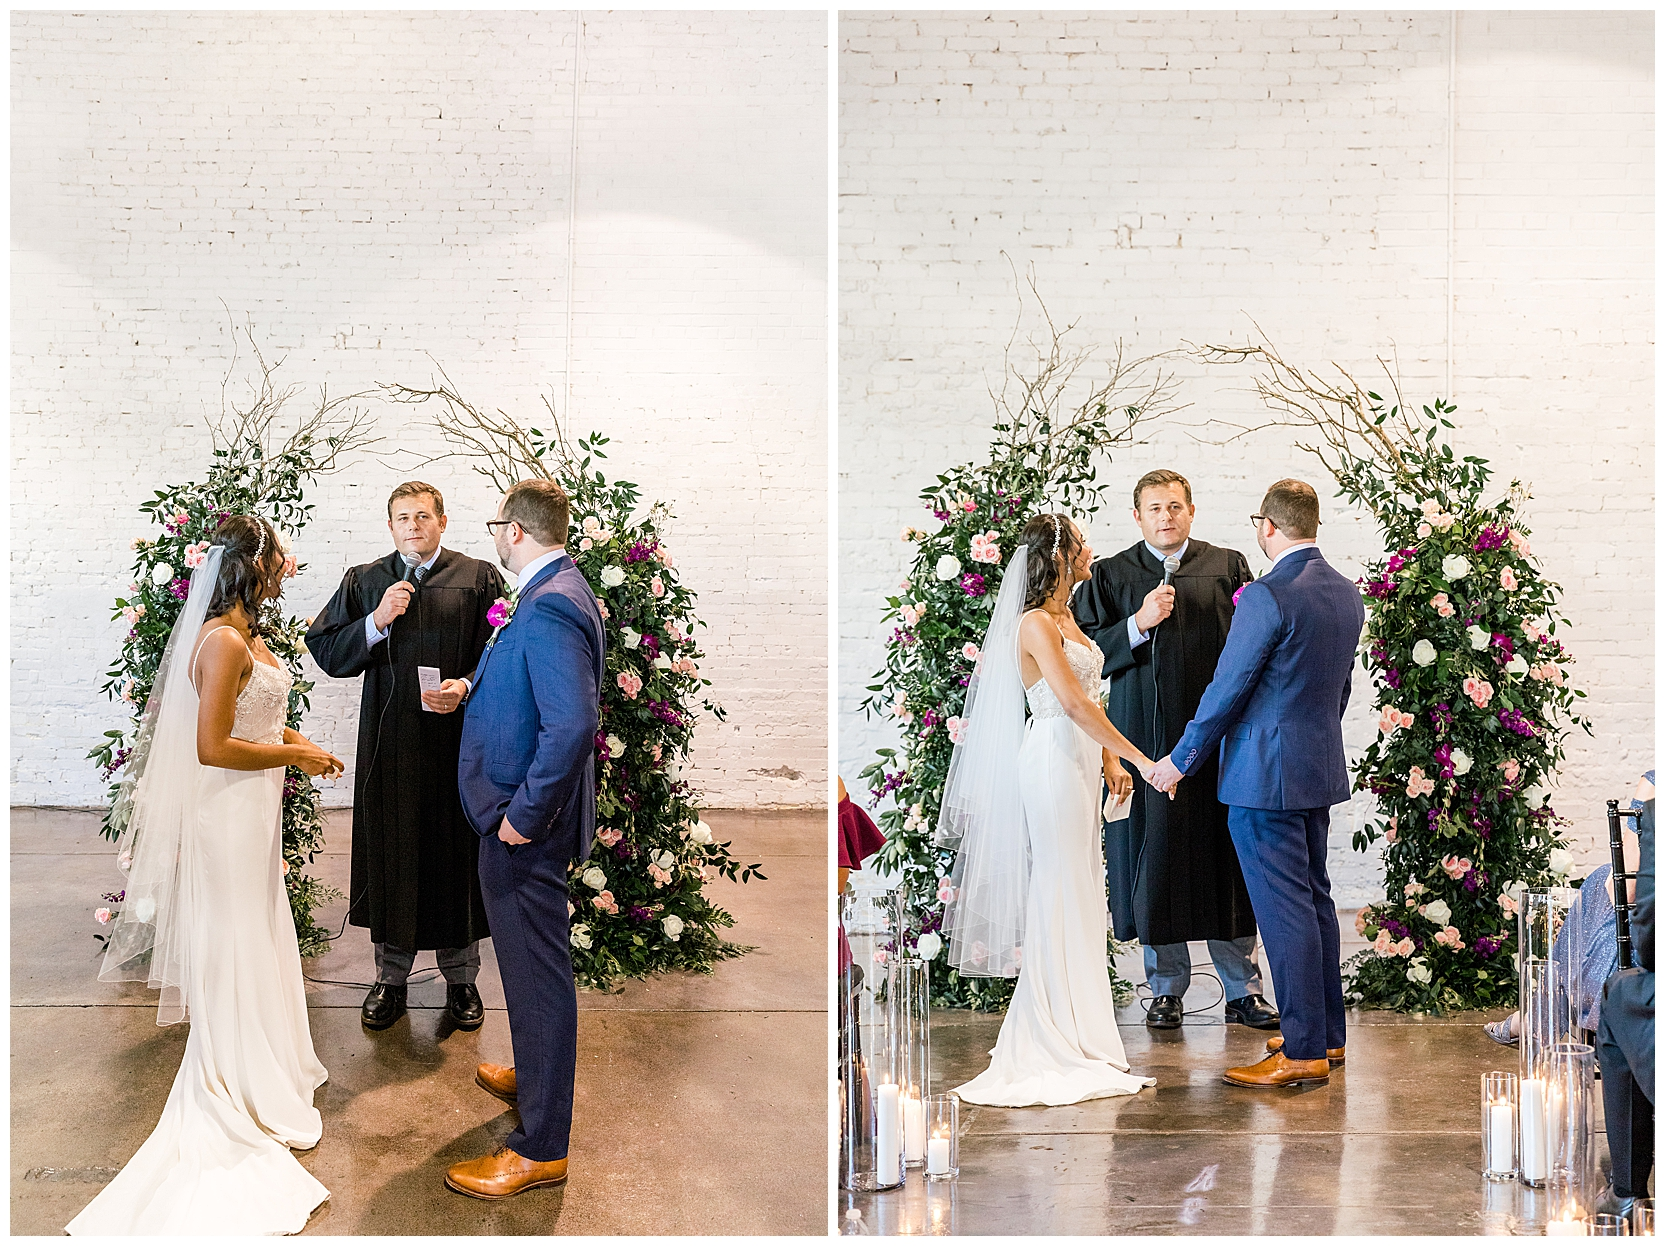 jessicafredericks_lakeland_tampa_wedding_purple_crazy hour_0045.jpg